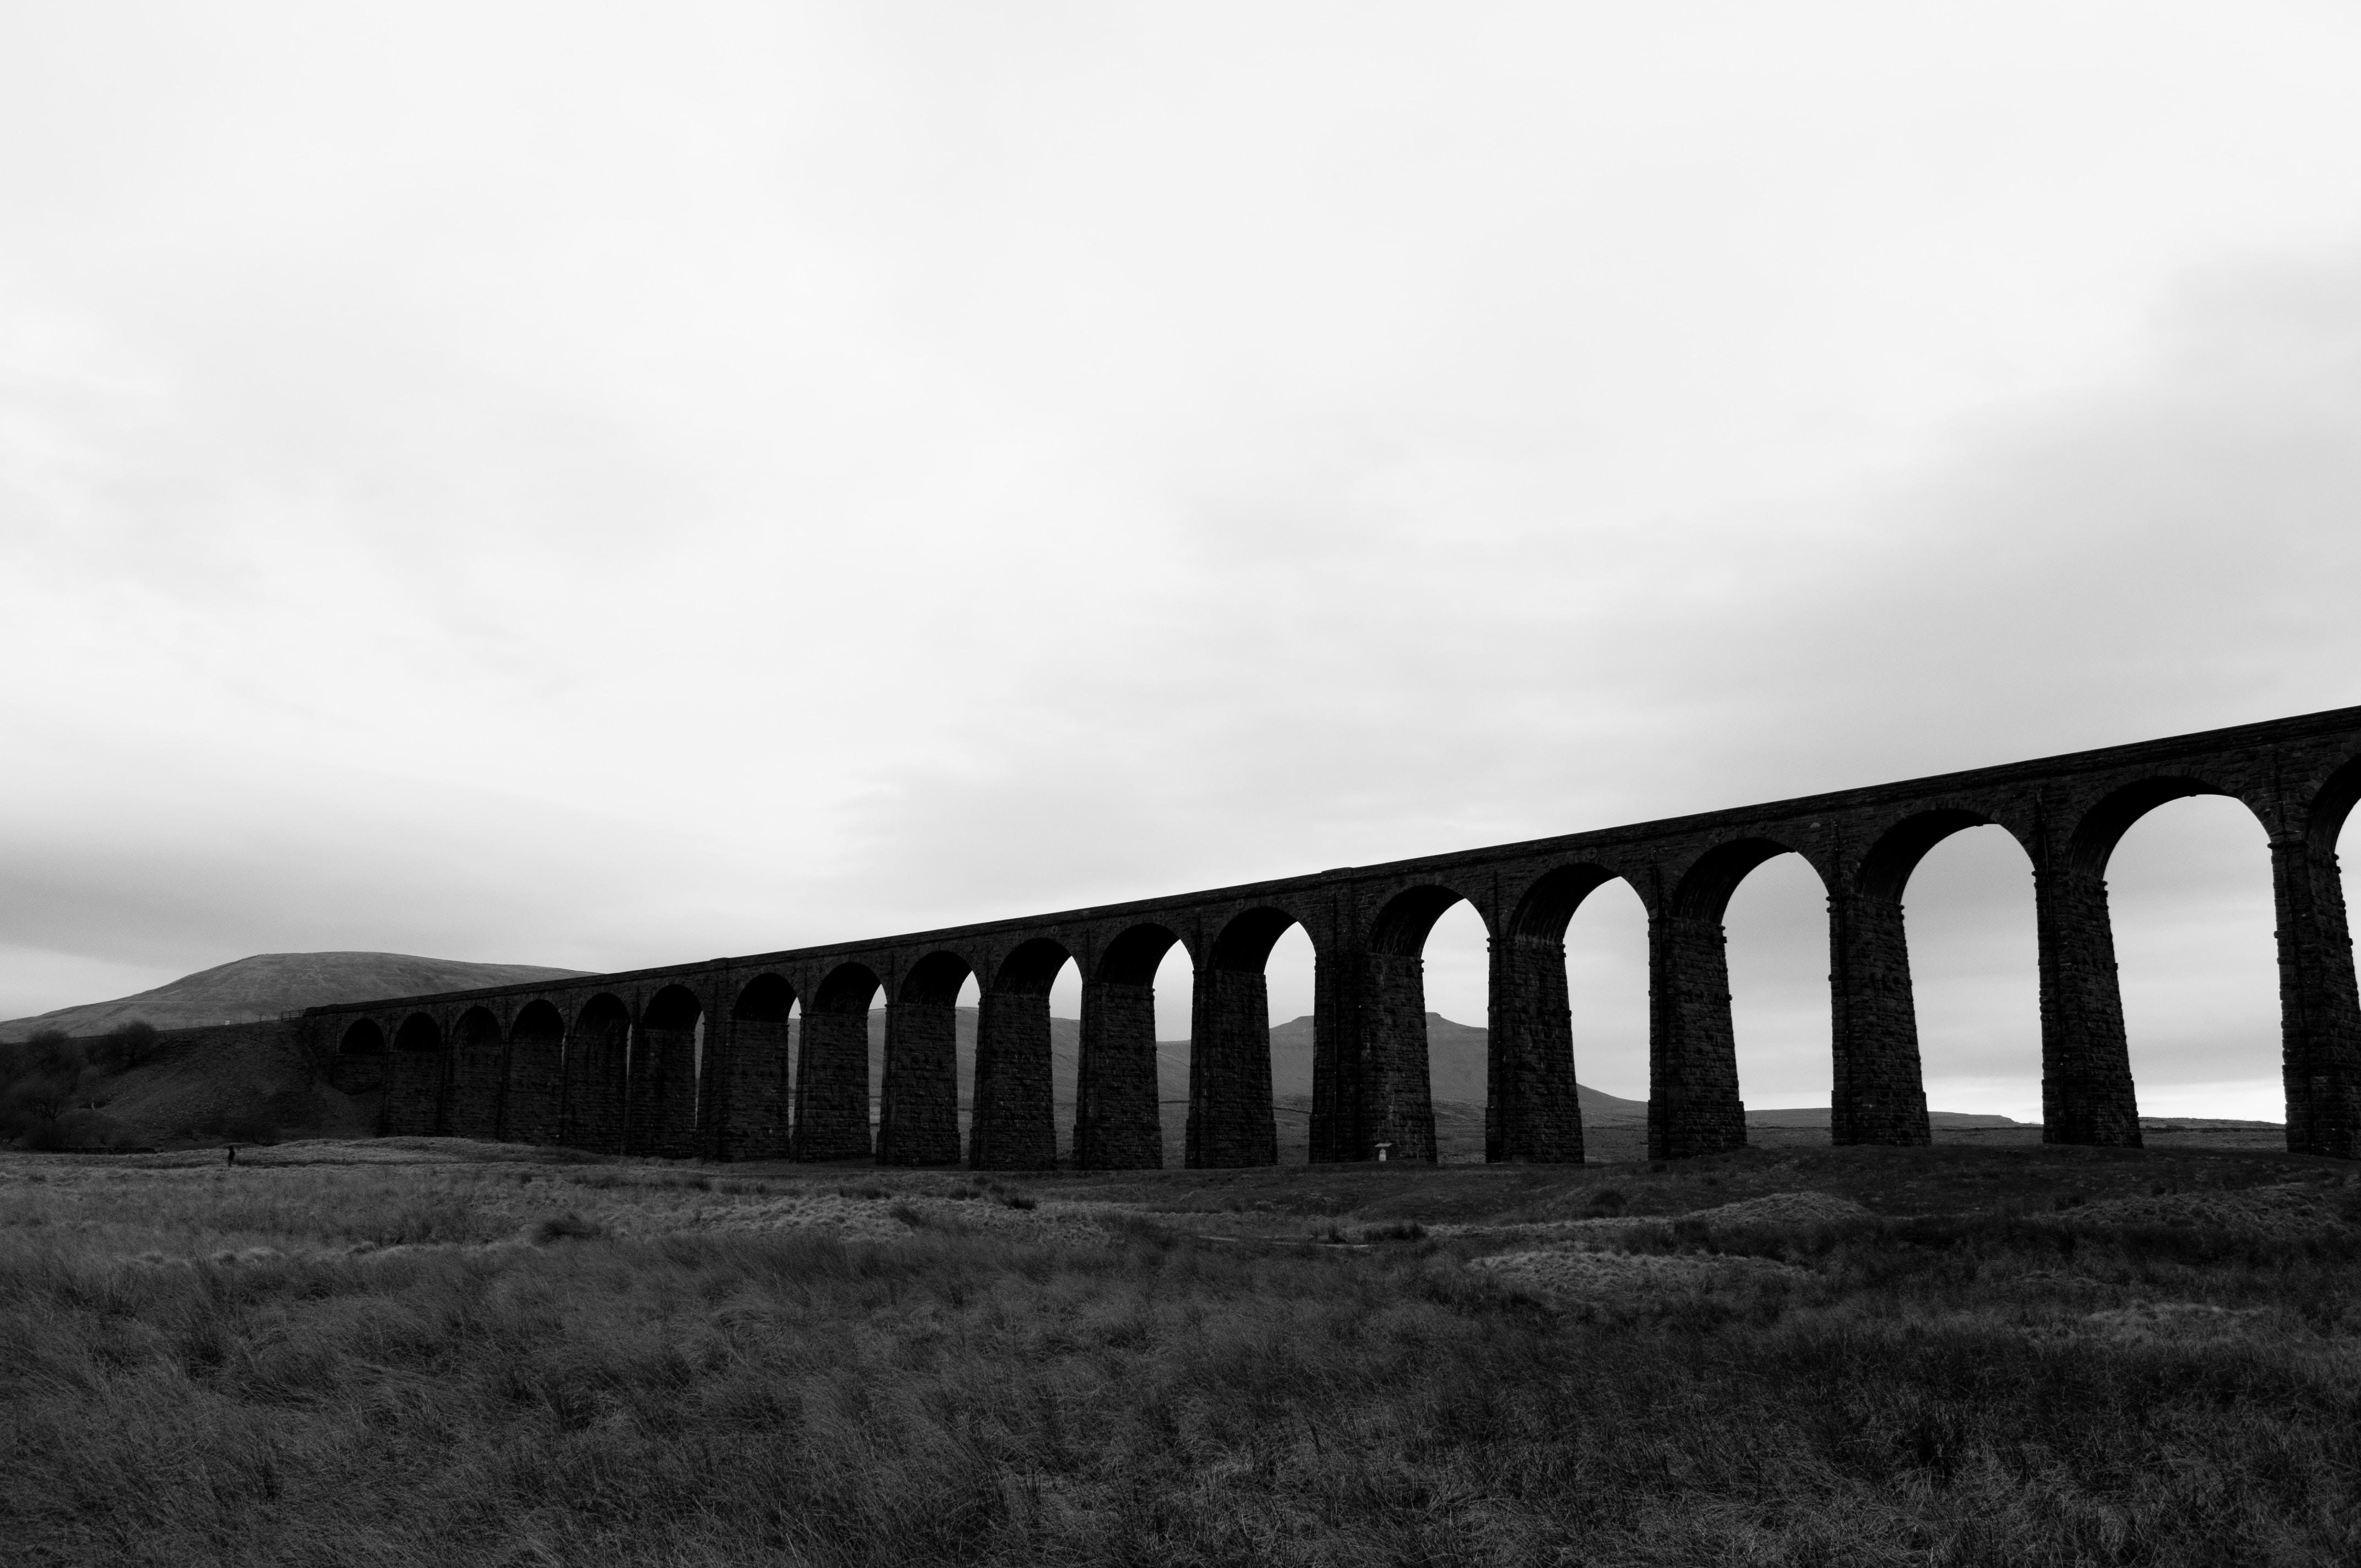 grayscale photo of bridge over the field